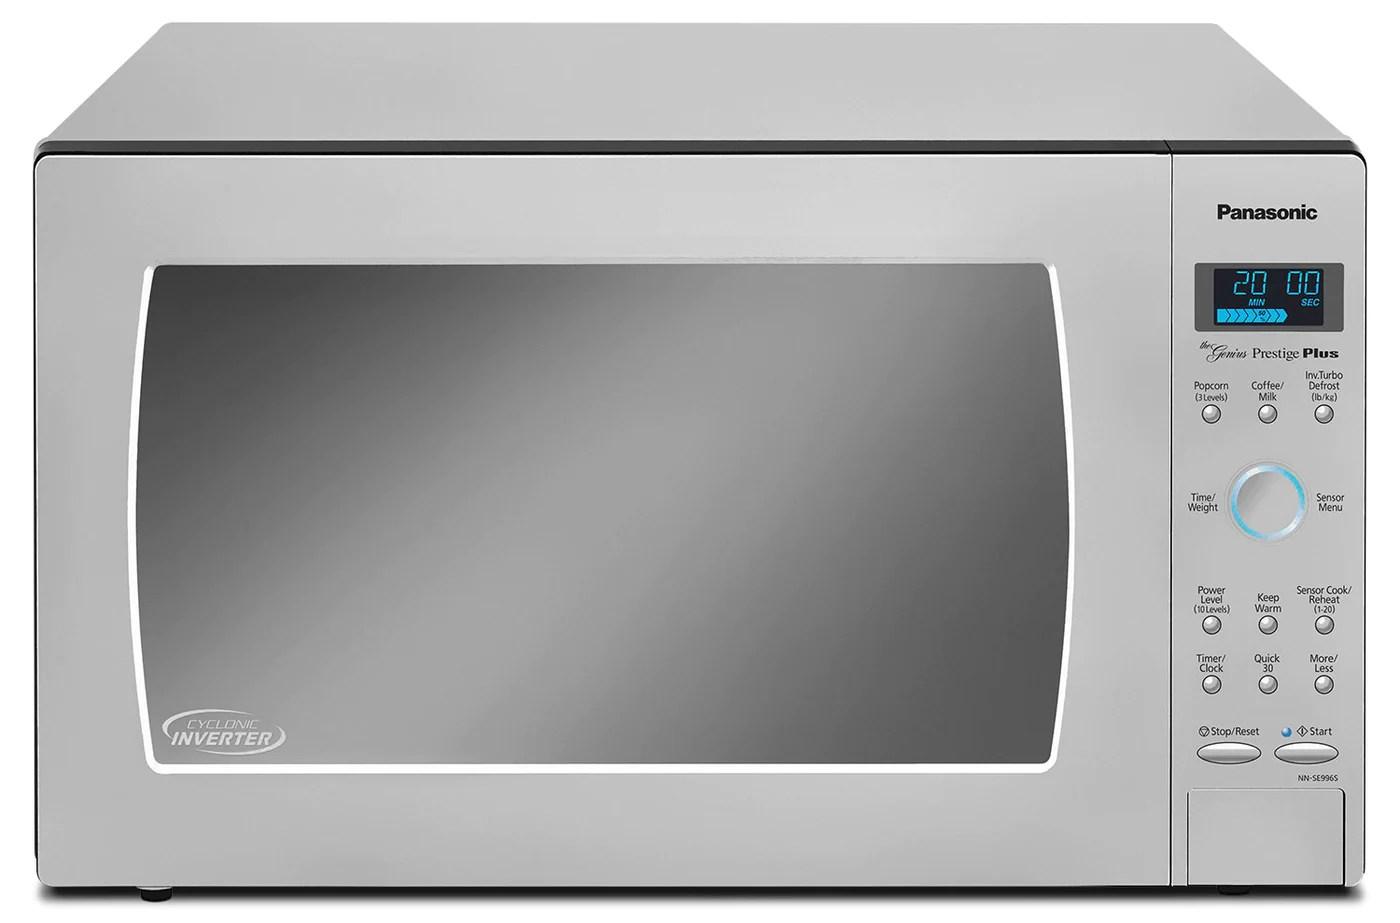 panasonic genius prestige 2 2 cu ft countertop microwave nn se996s